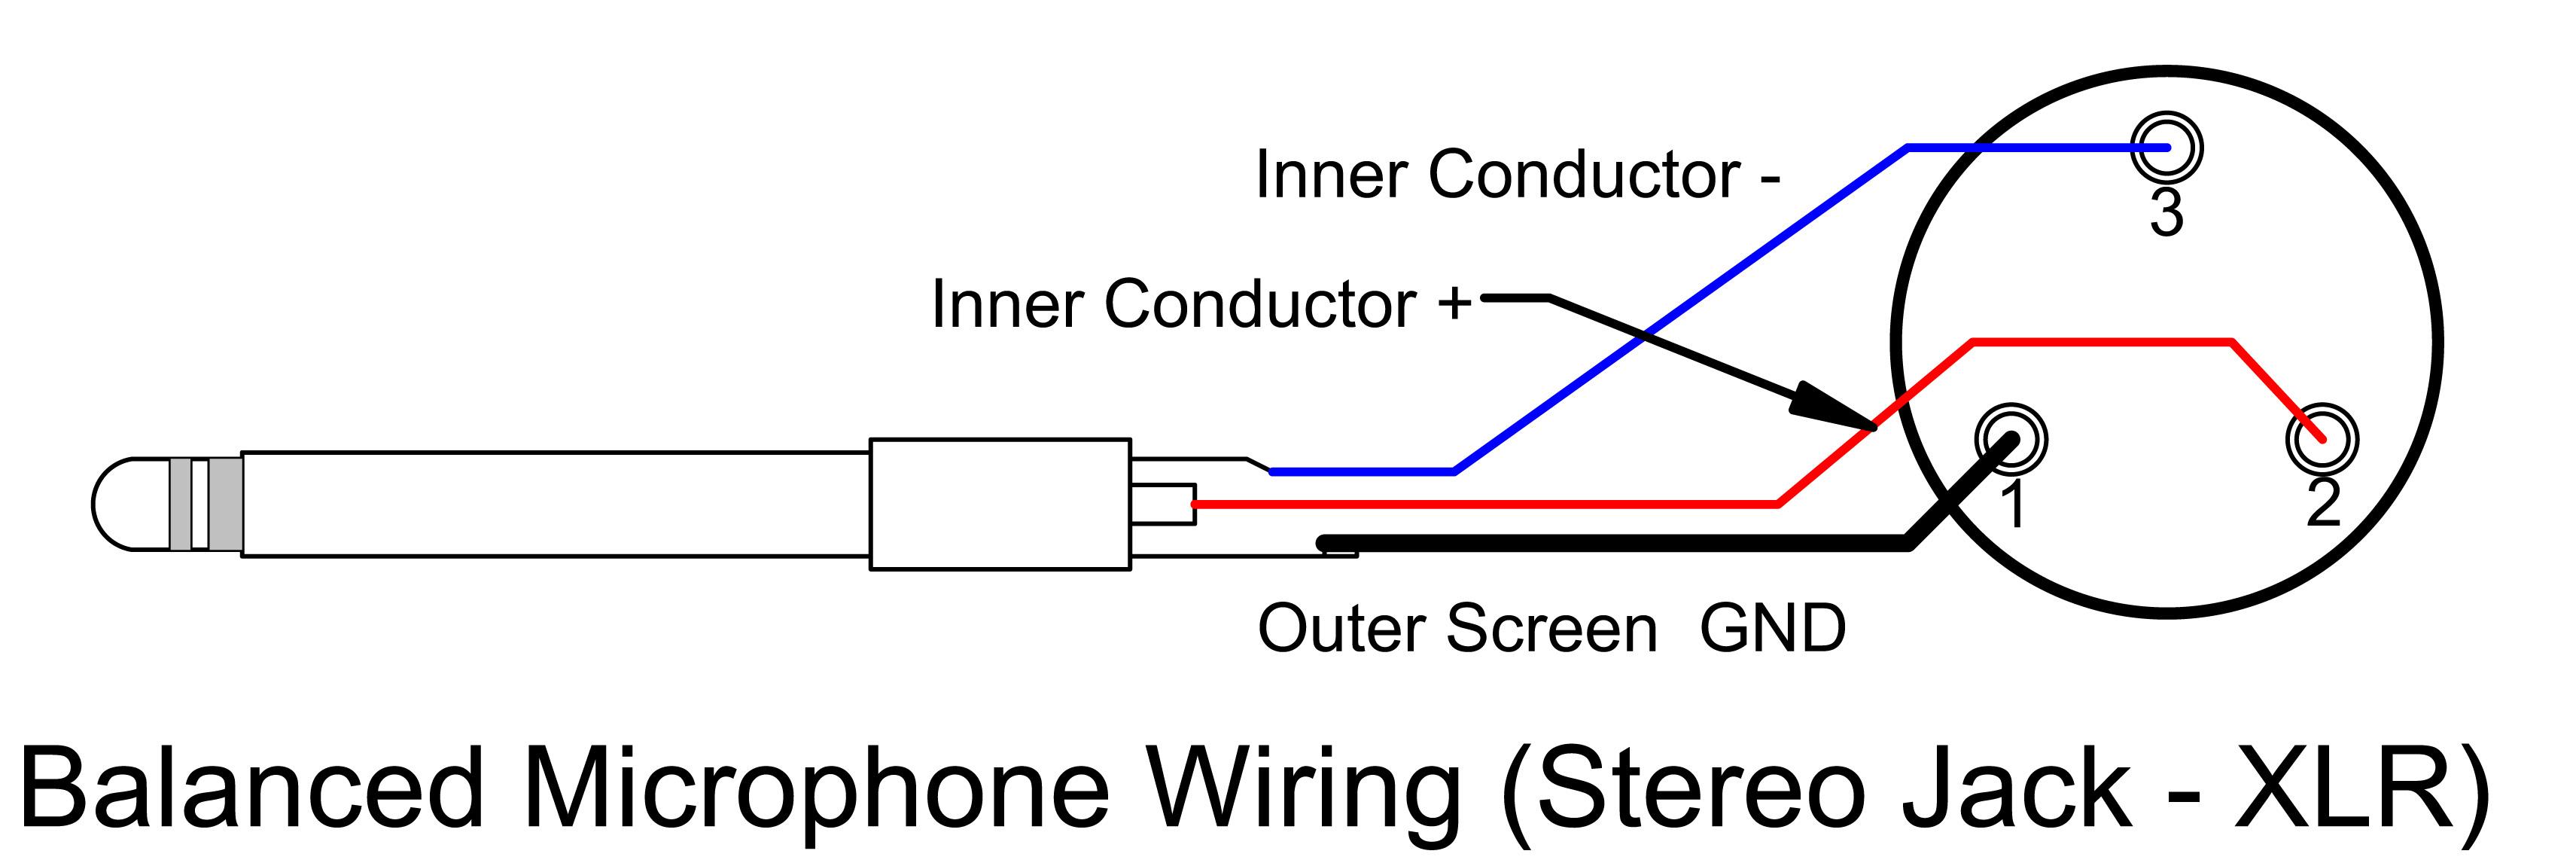 Terralec Cable Connectors